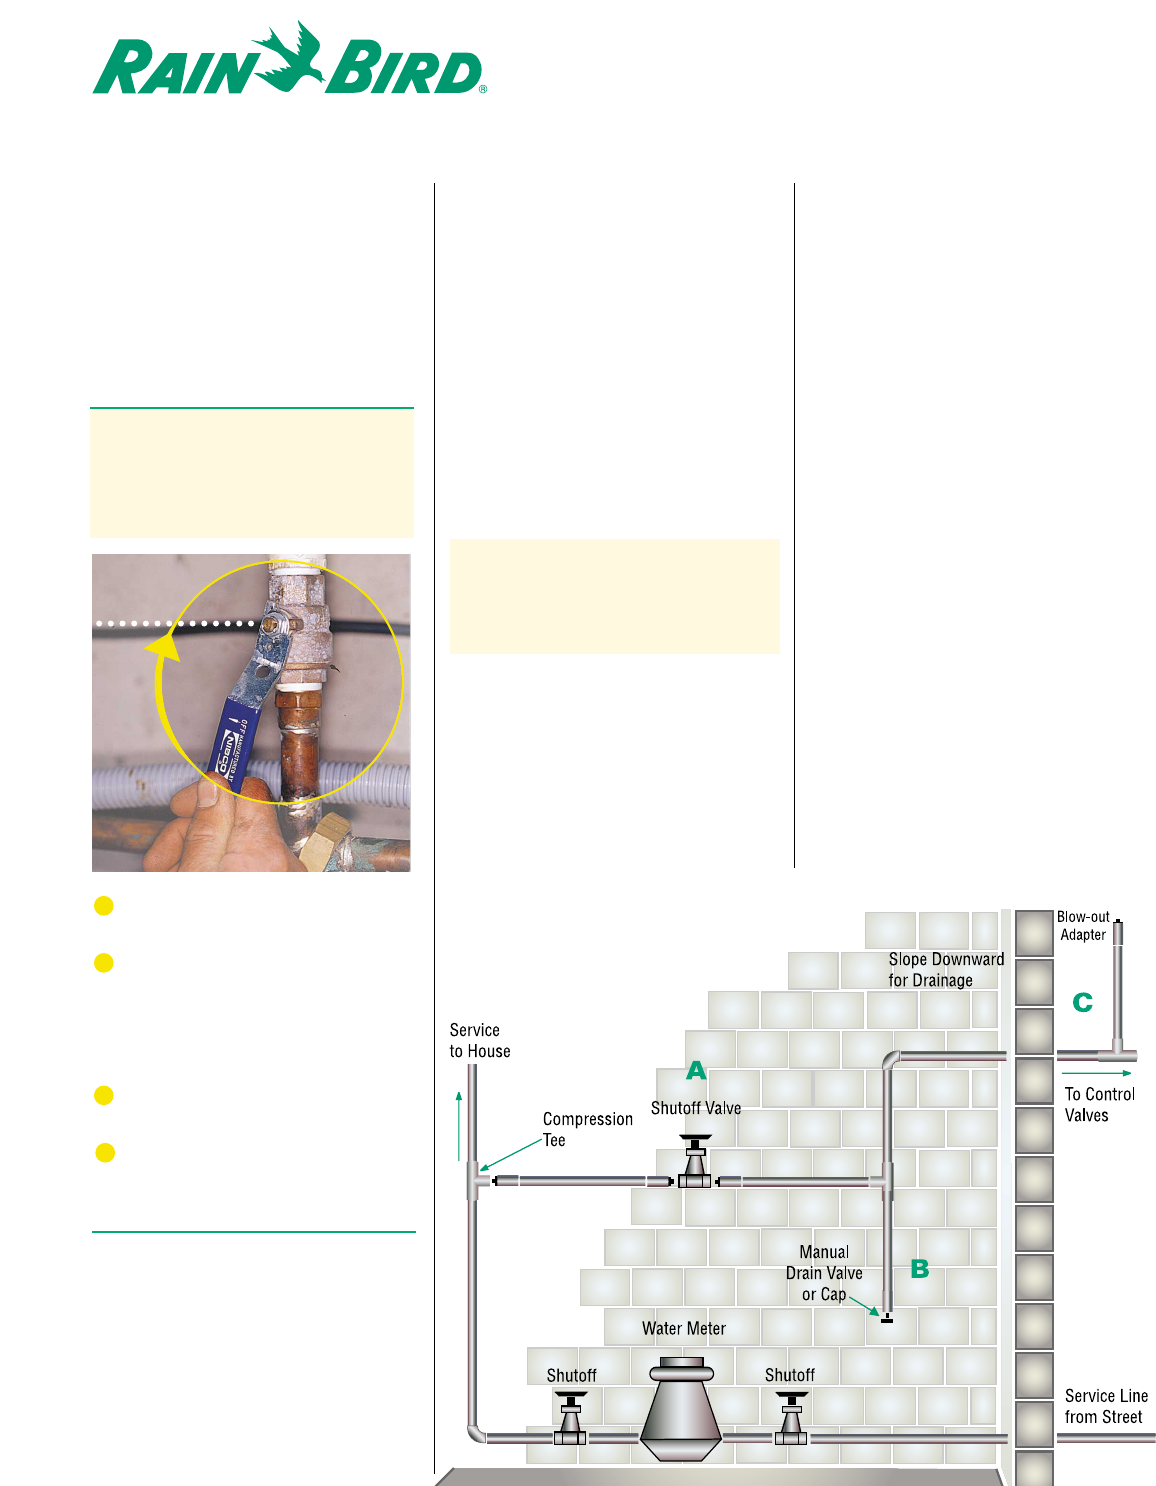 Sprinkler Valve Diagram Wiring Diagram Two Valves